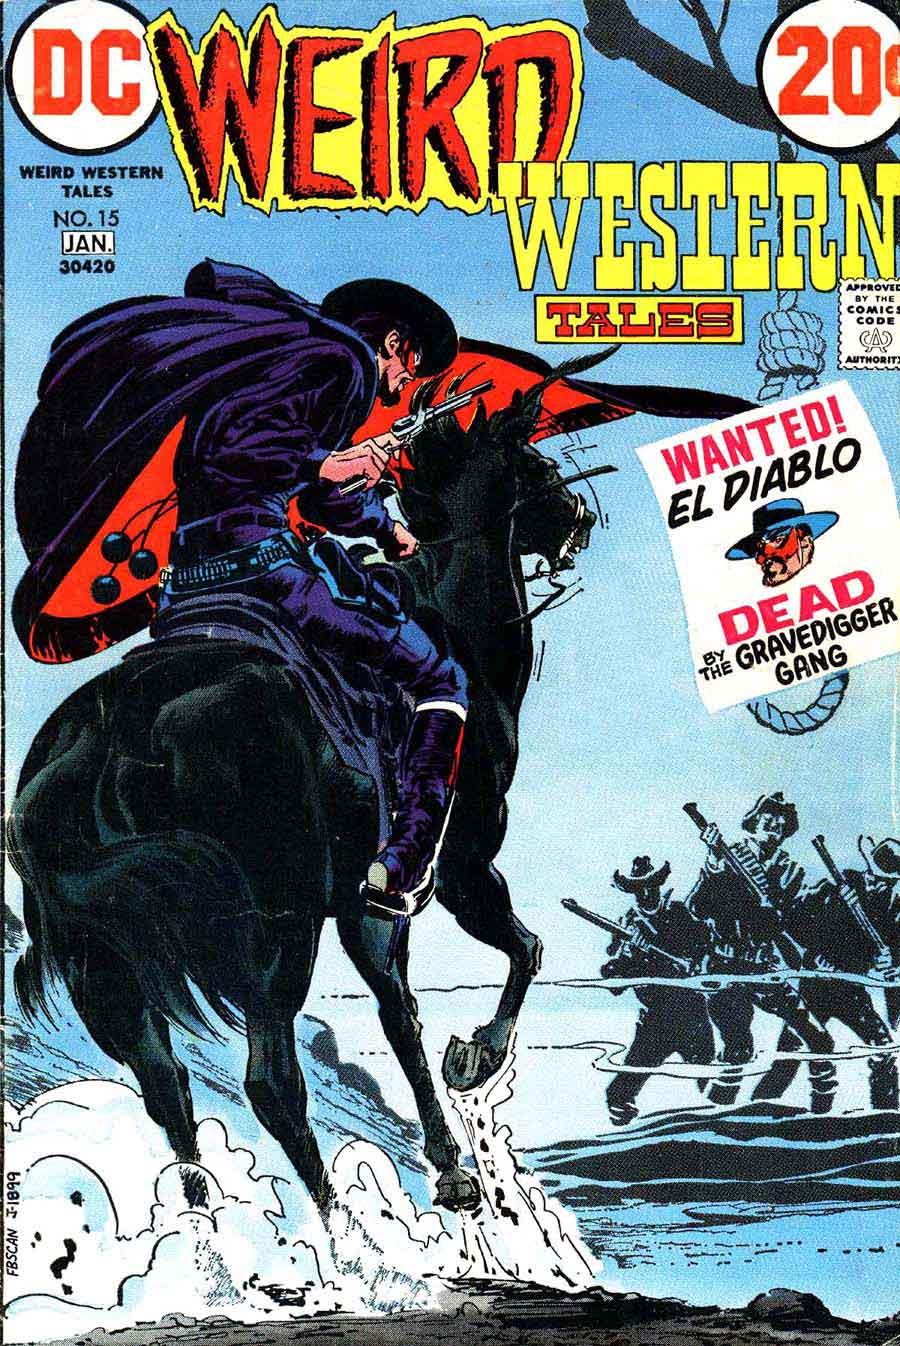 Western Book Cover Art : Weird western tales neal adams art cover pencil ink